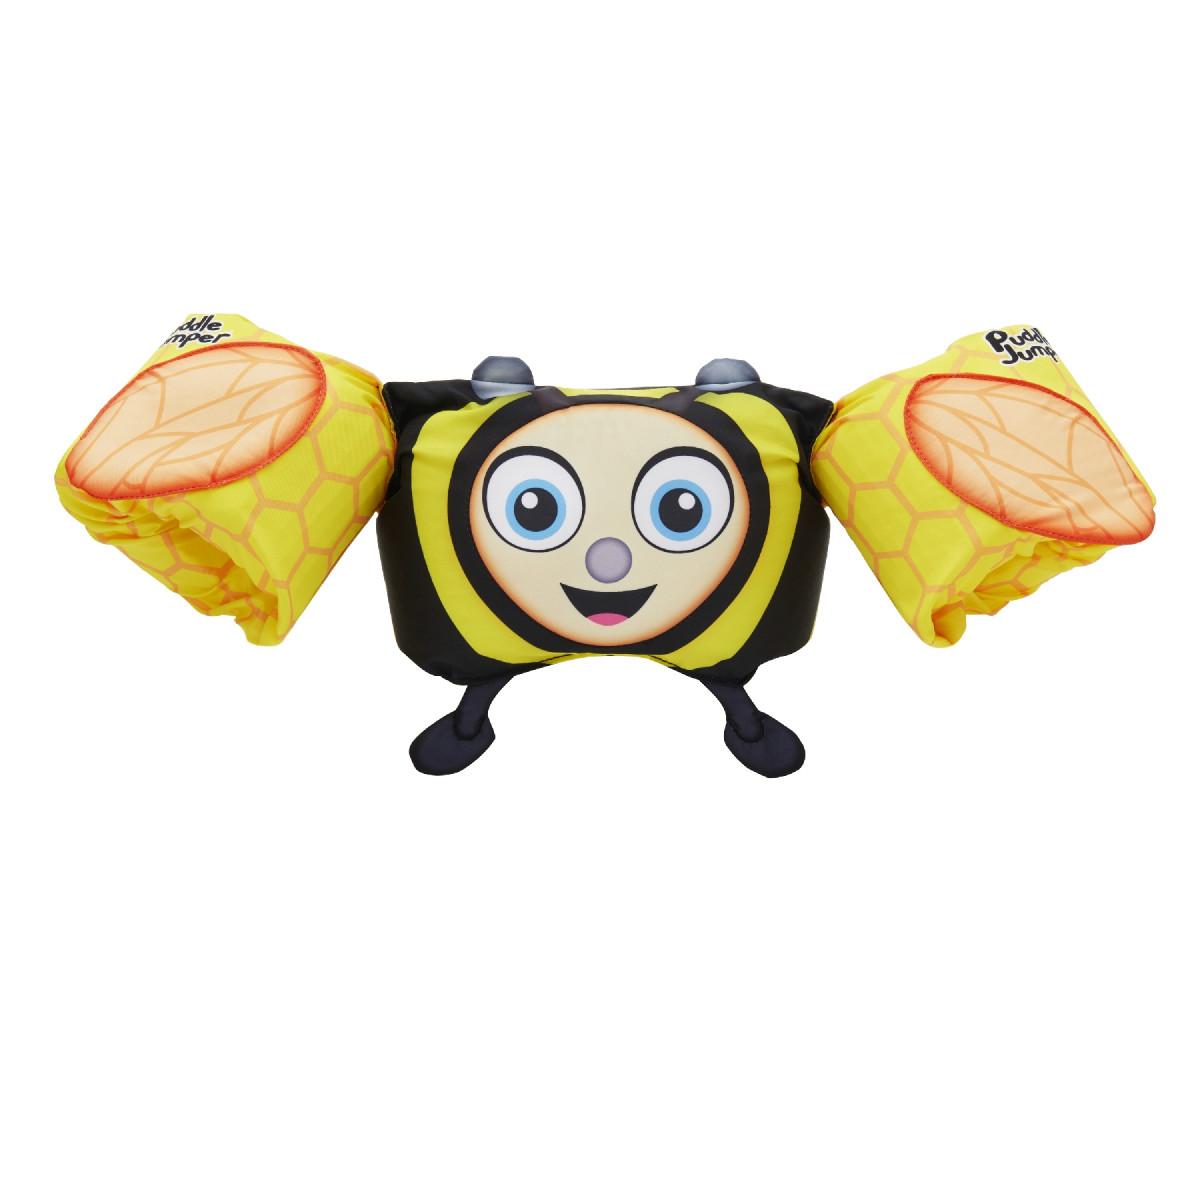 plovací vesta plaváček-sevylor-3d-puddle-jumper včela.jpg